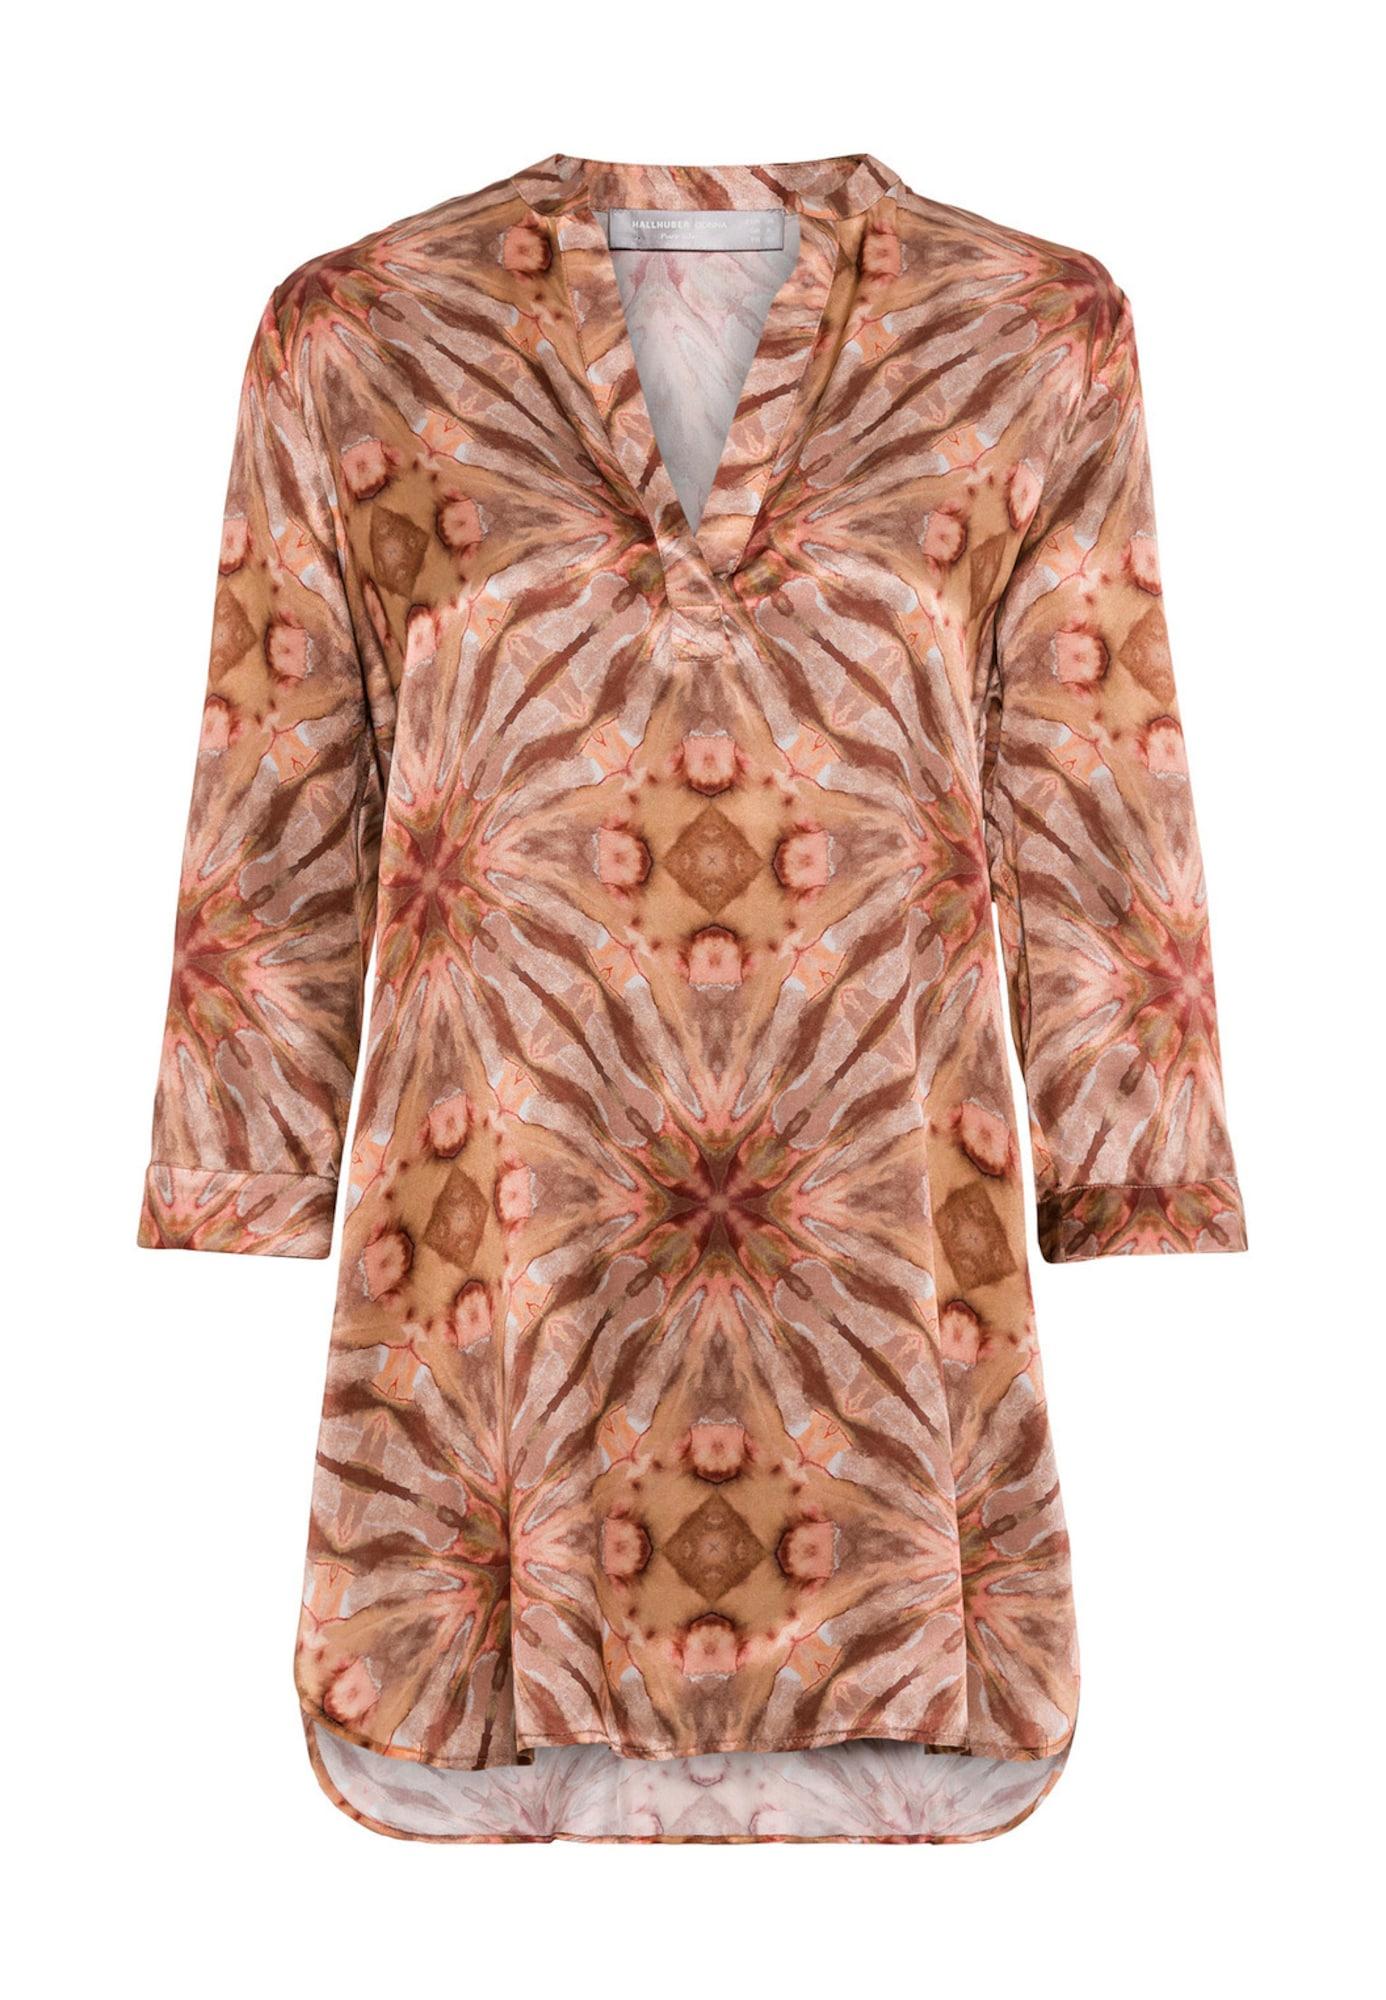 Seidentunika mit Batikdruck | Bekleidung > Tuniken > Seidentuniken | HALLHUBER